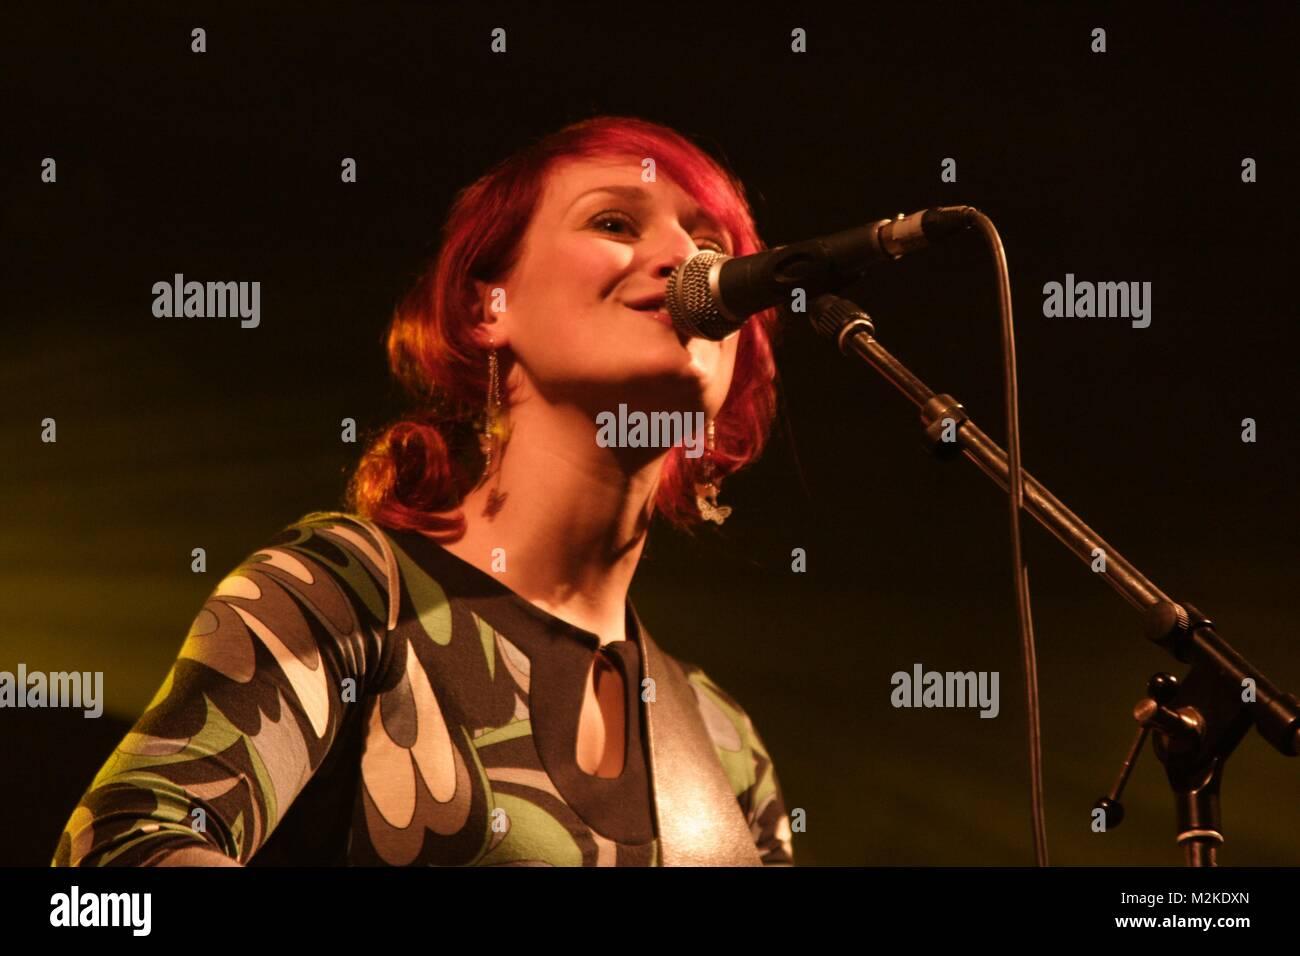 diane weigmann live concert columbia halle / b - Stock Image